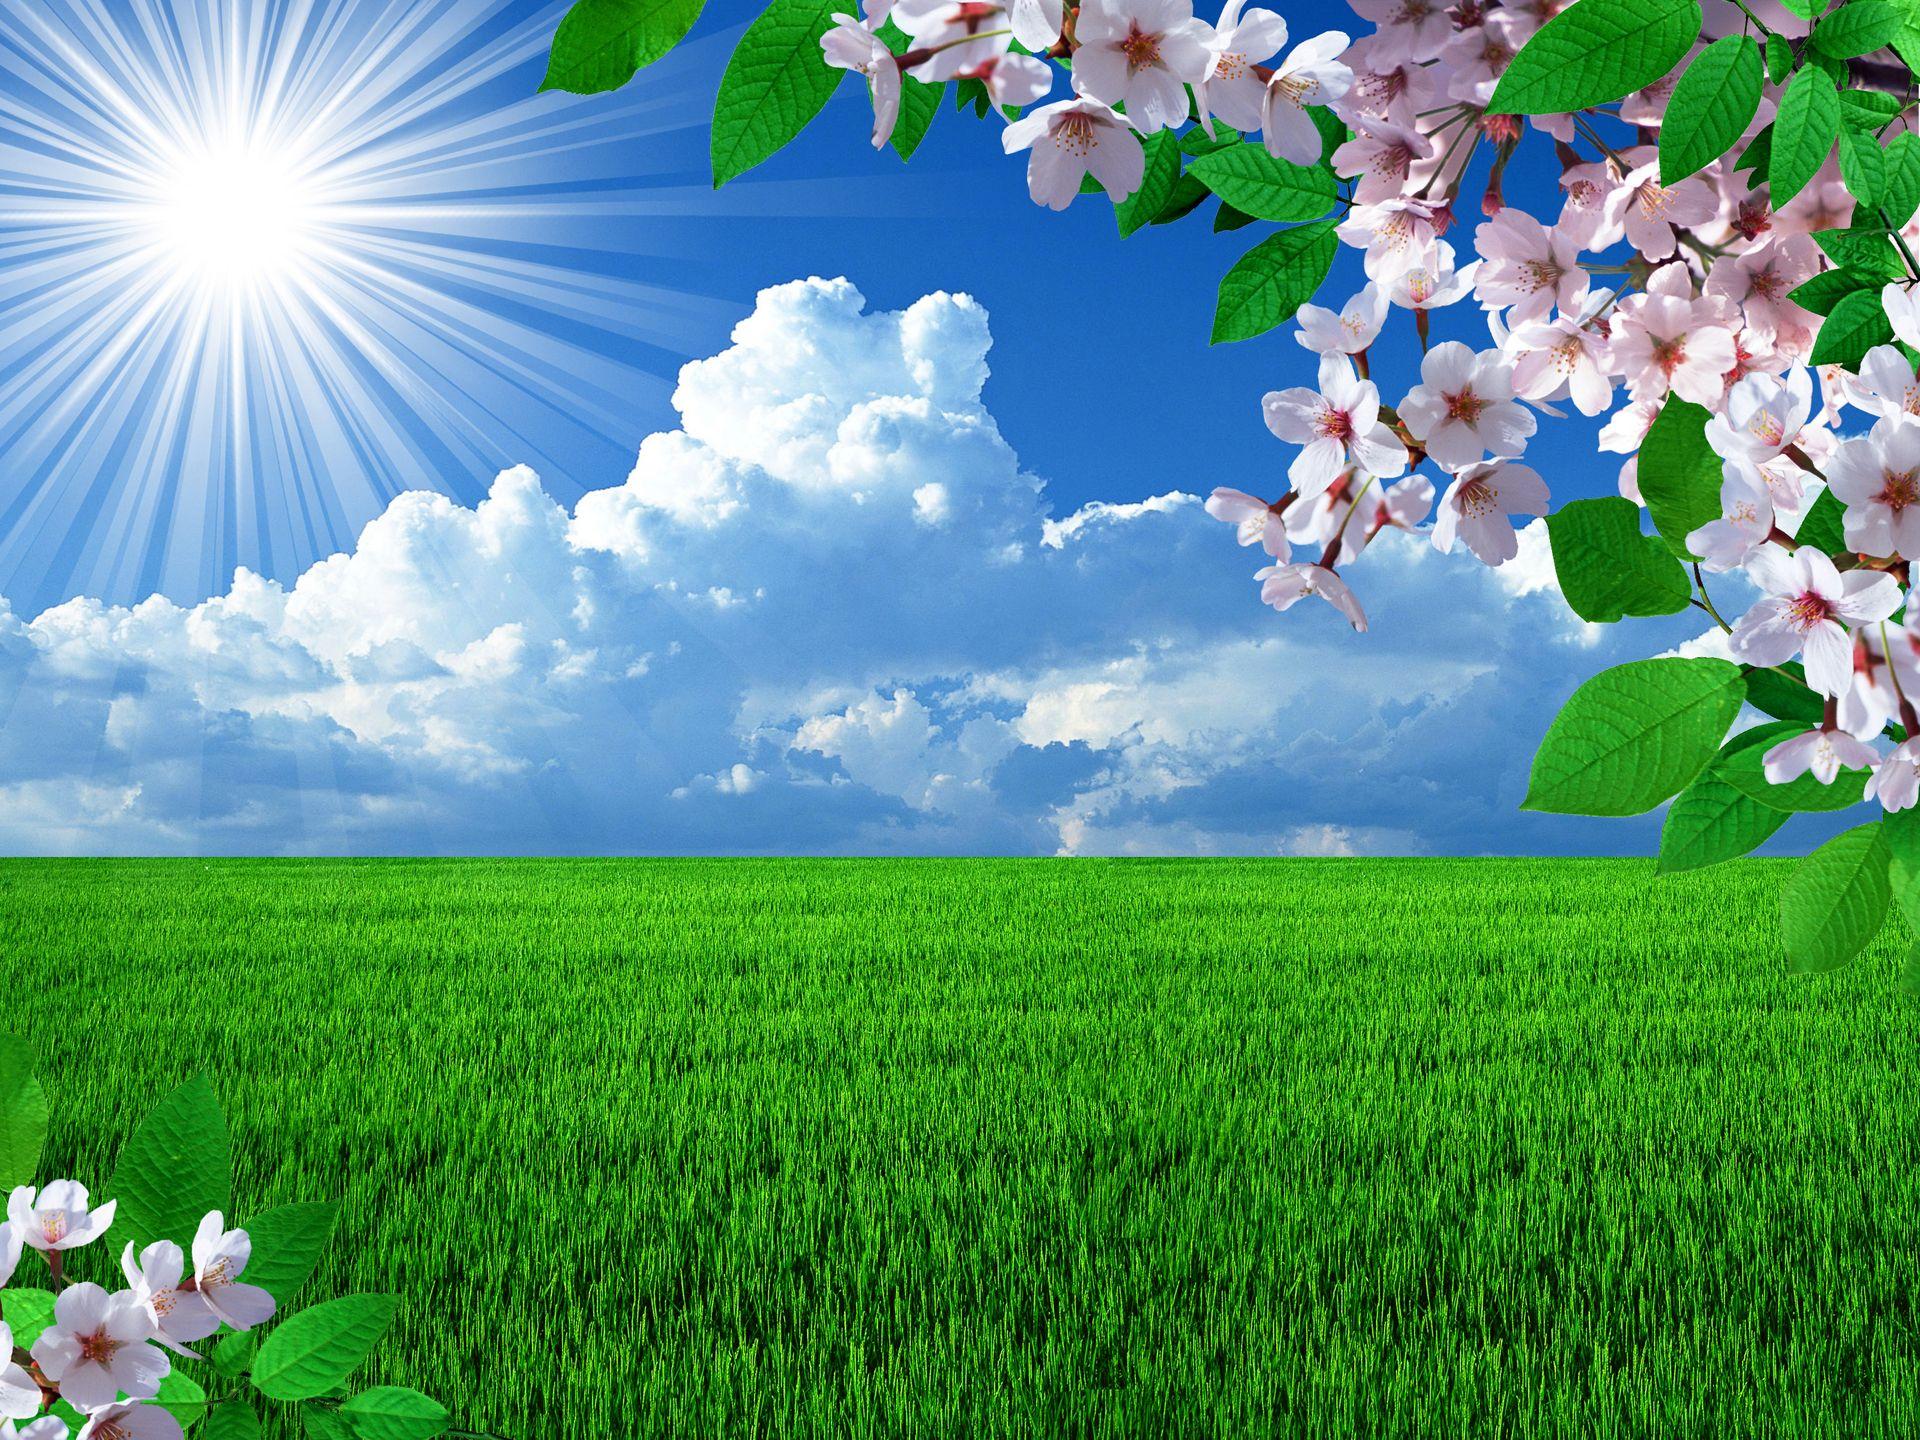 Free Spring Desktop Wallpapers Backgrounds Wallpapersafari Beautiful Nature Spring Spring Desktop Wallpaper